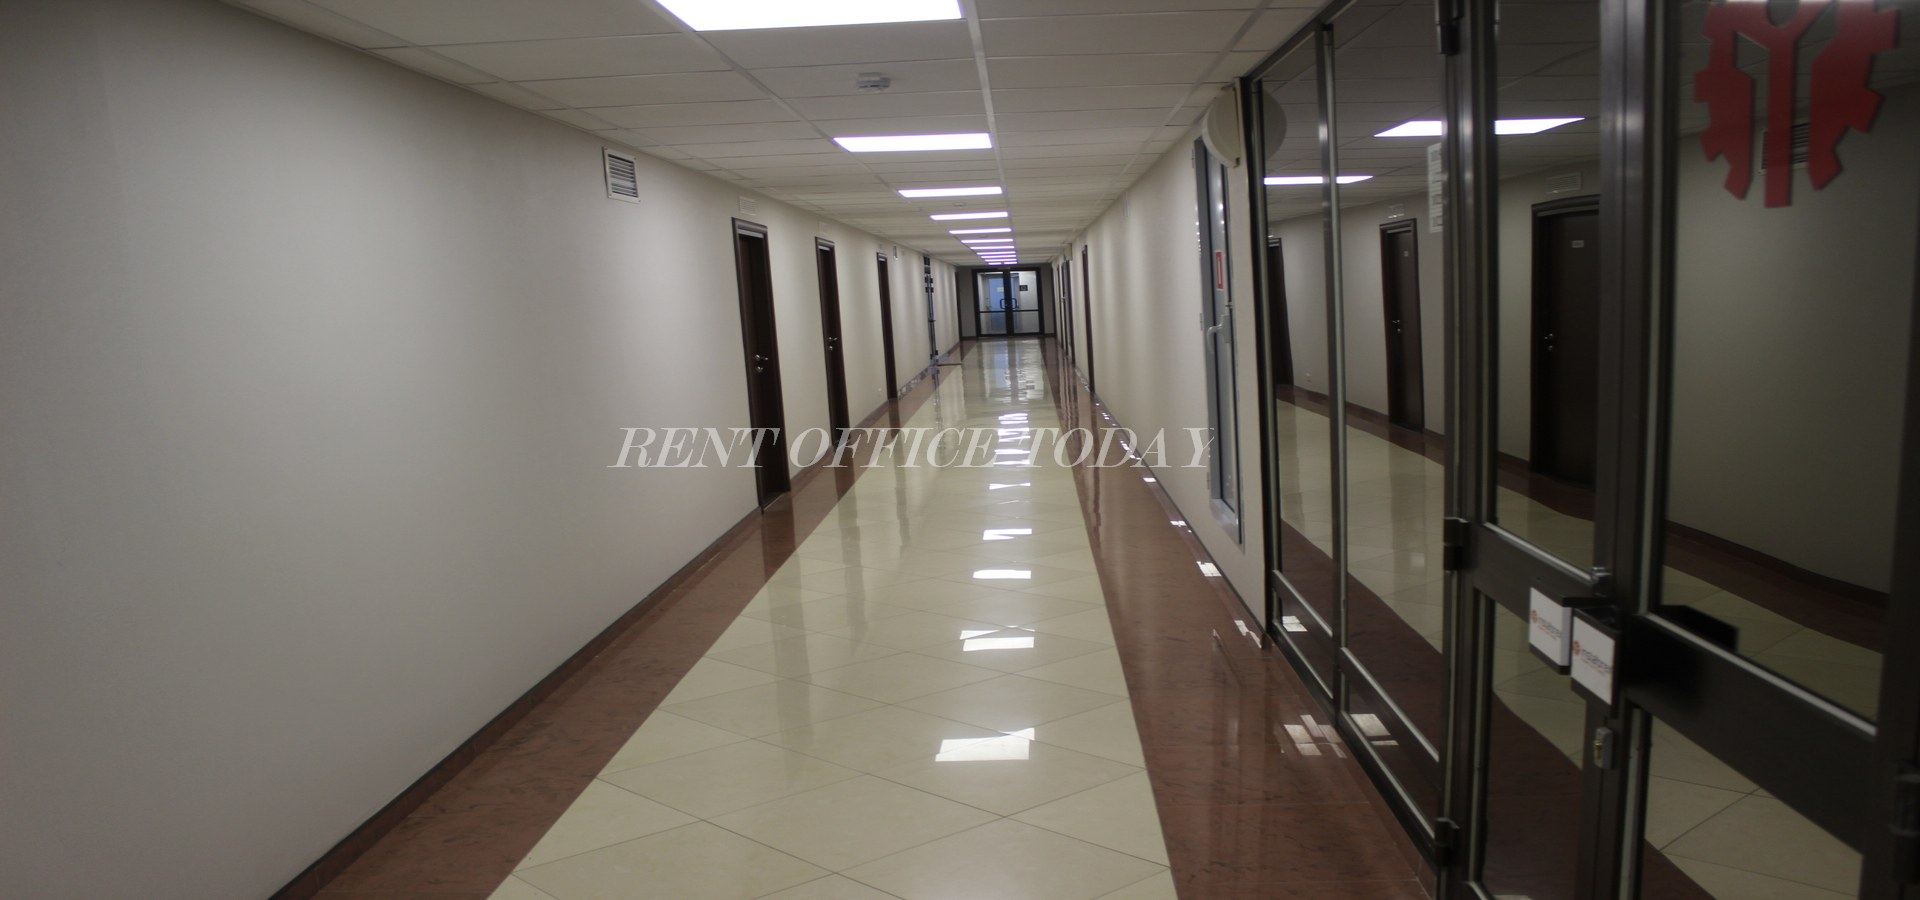 Бизнес центр Новый арбат 21